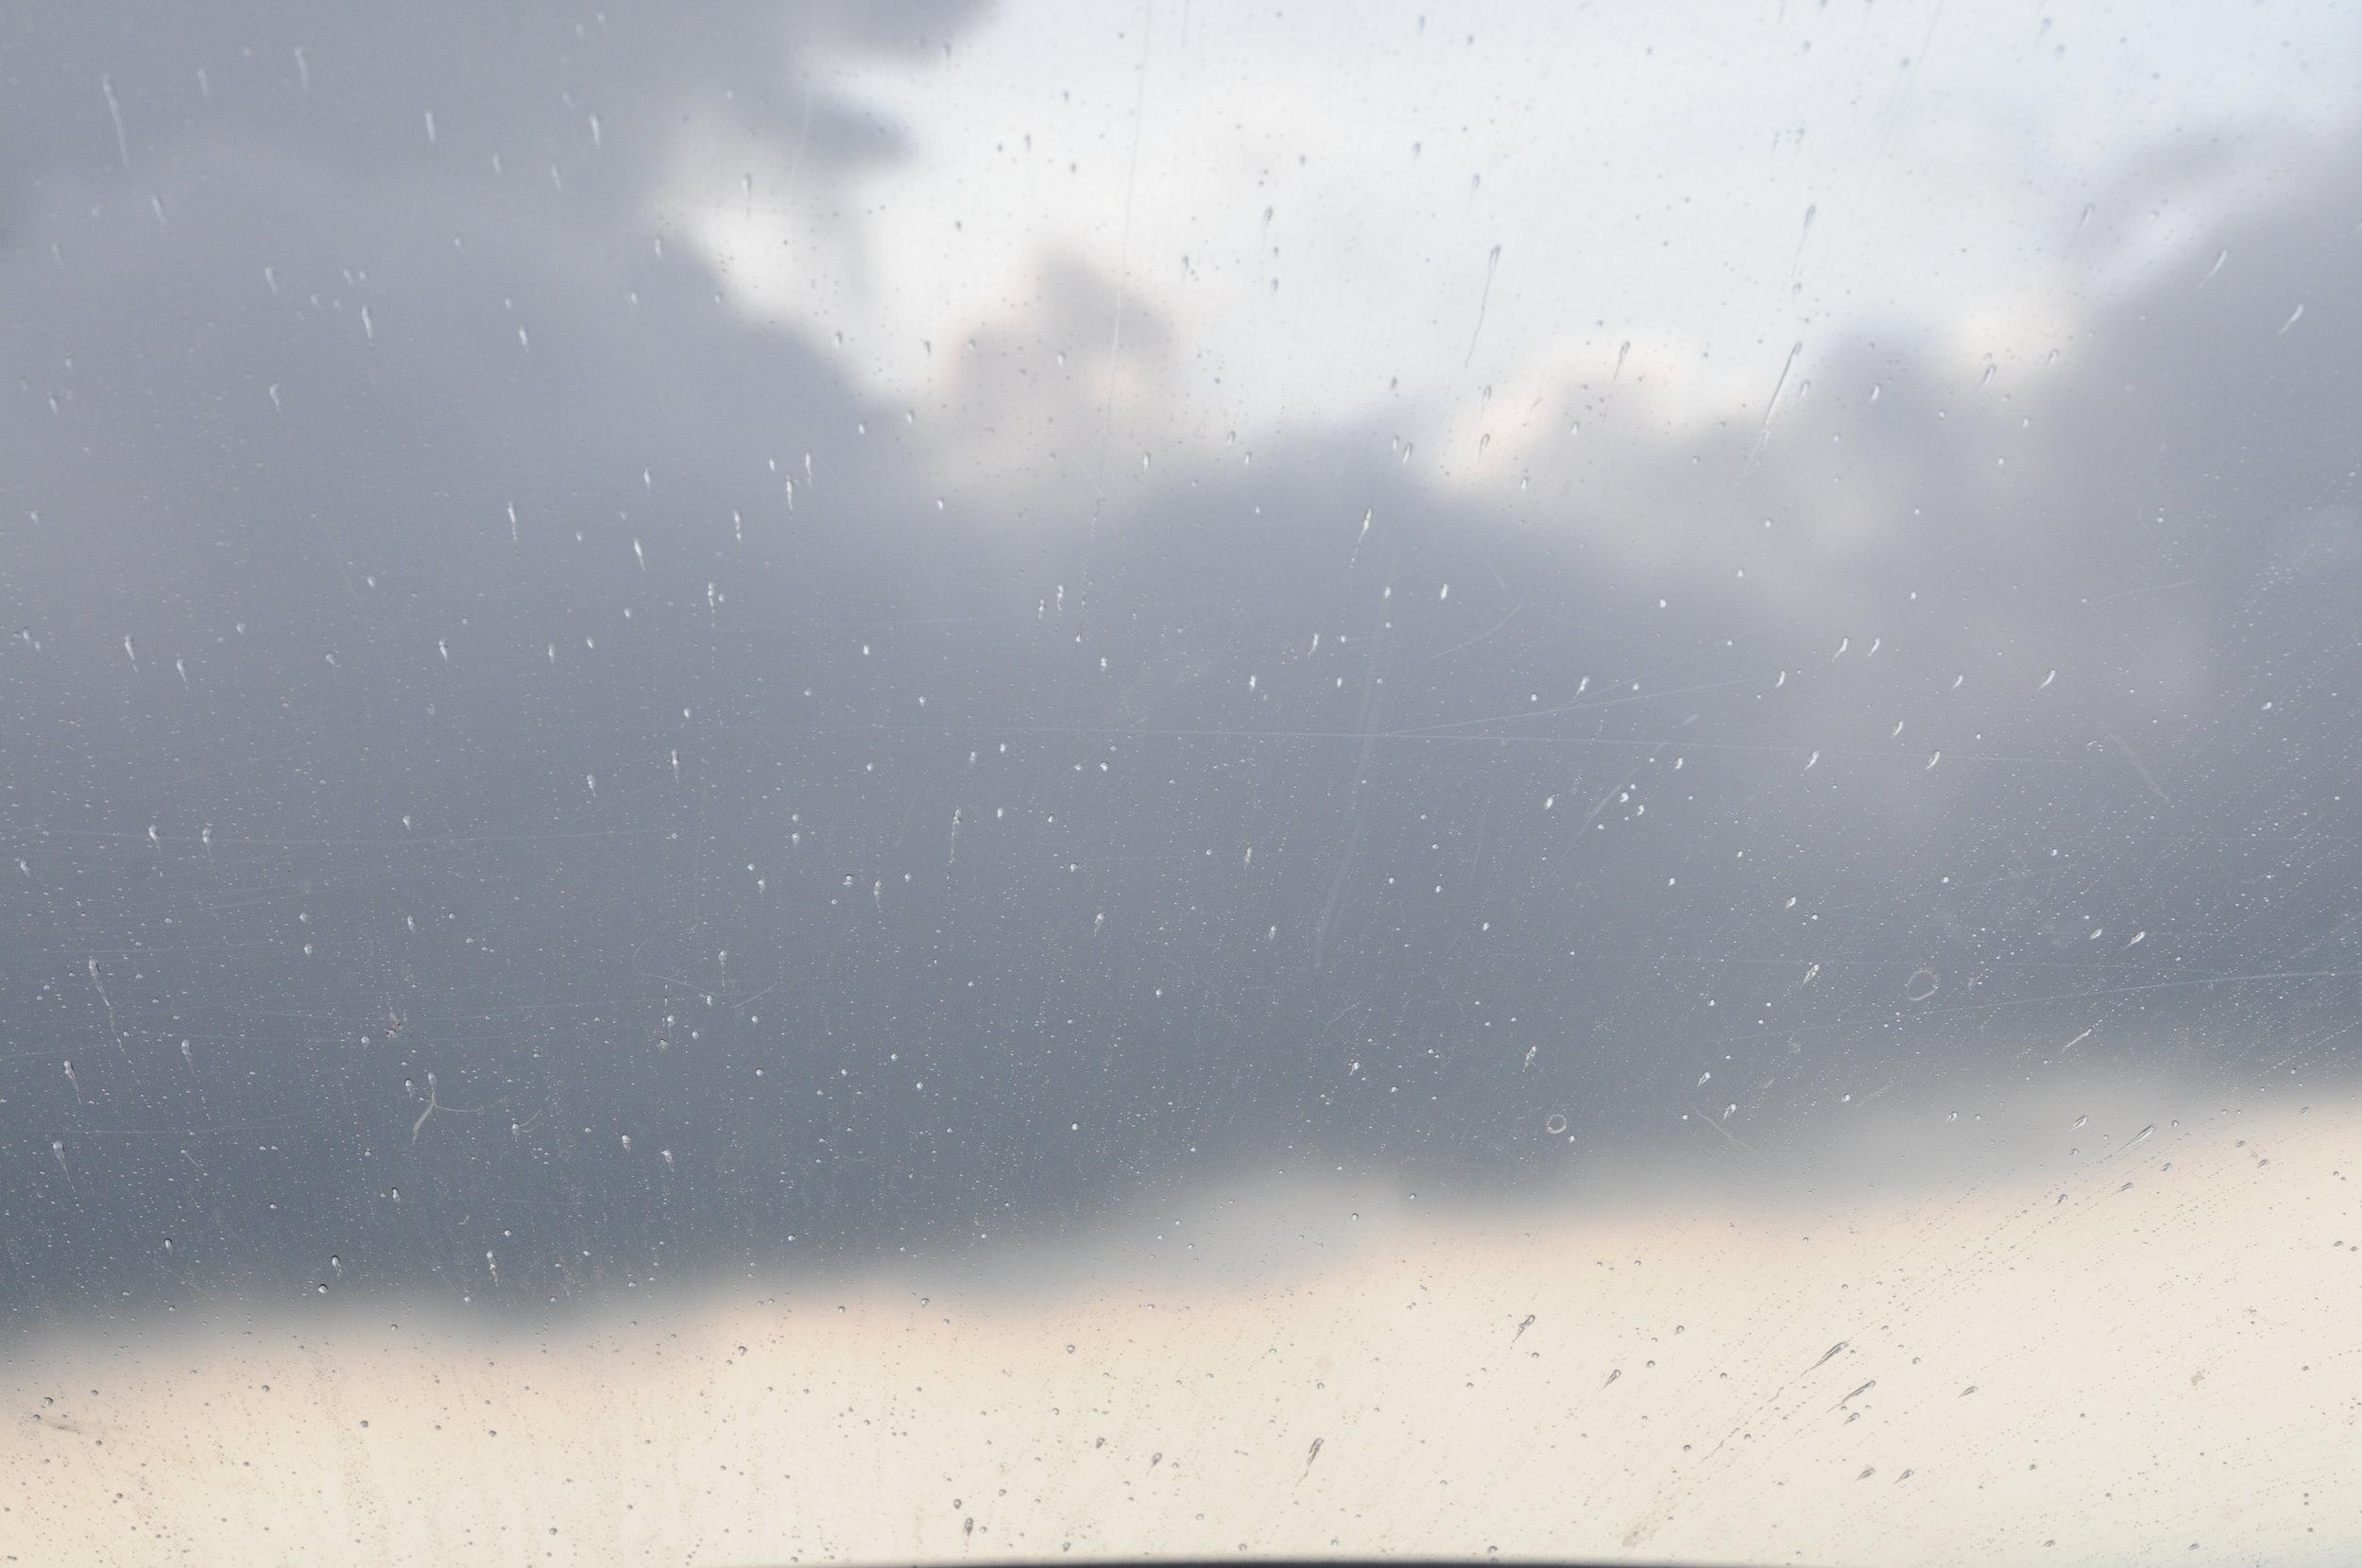 _A_Raining and flying 8-3-11 001.JPG